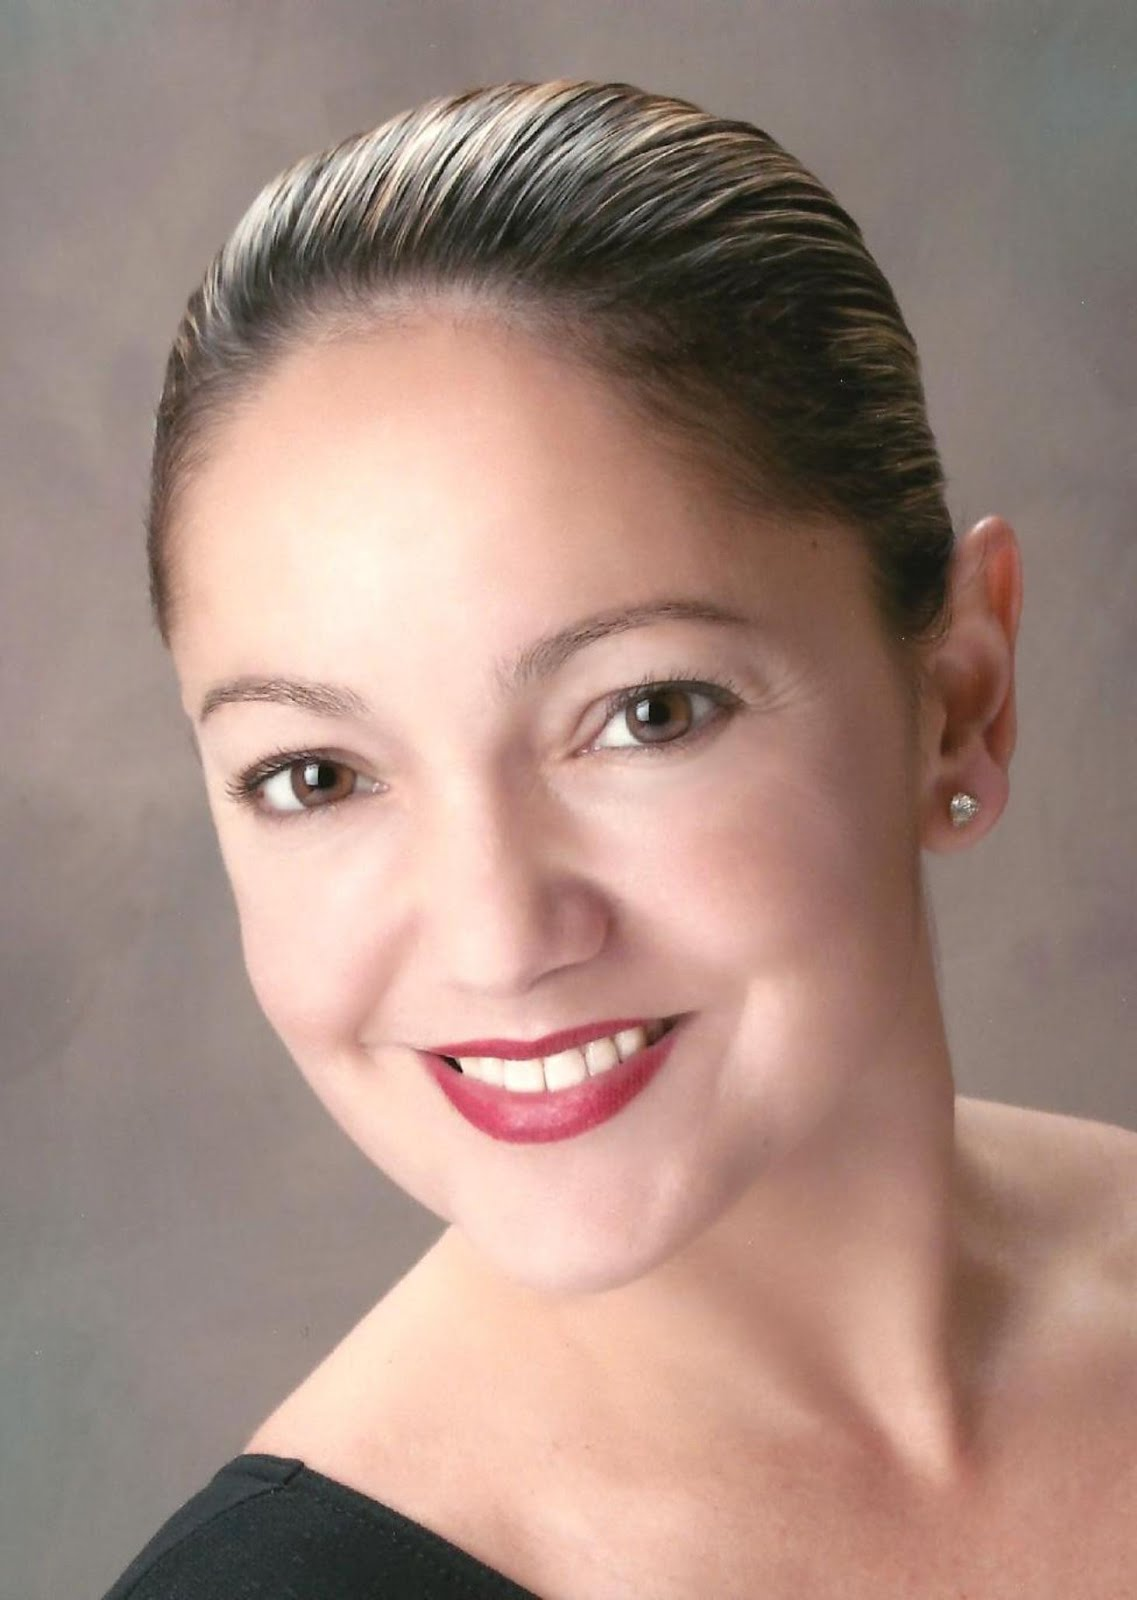 <b>Patricia Beal<b><br><i>USA<i></i></i></b></b>